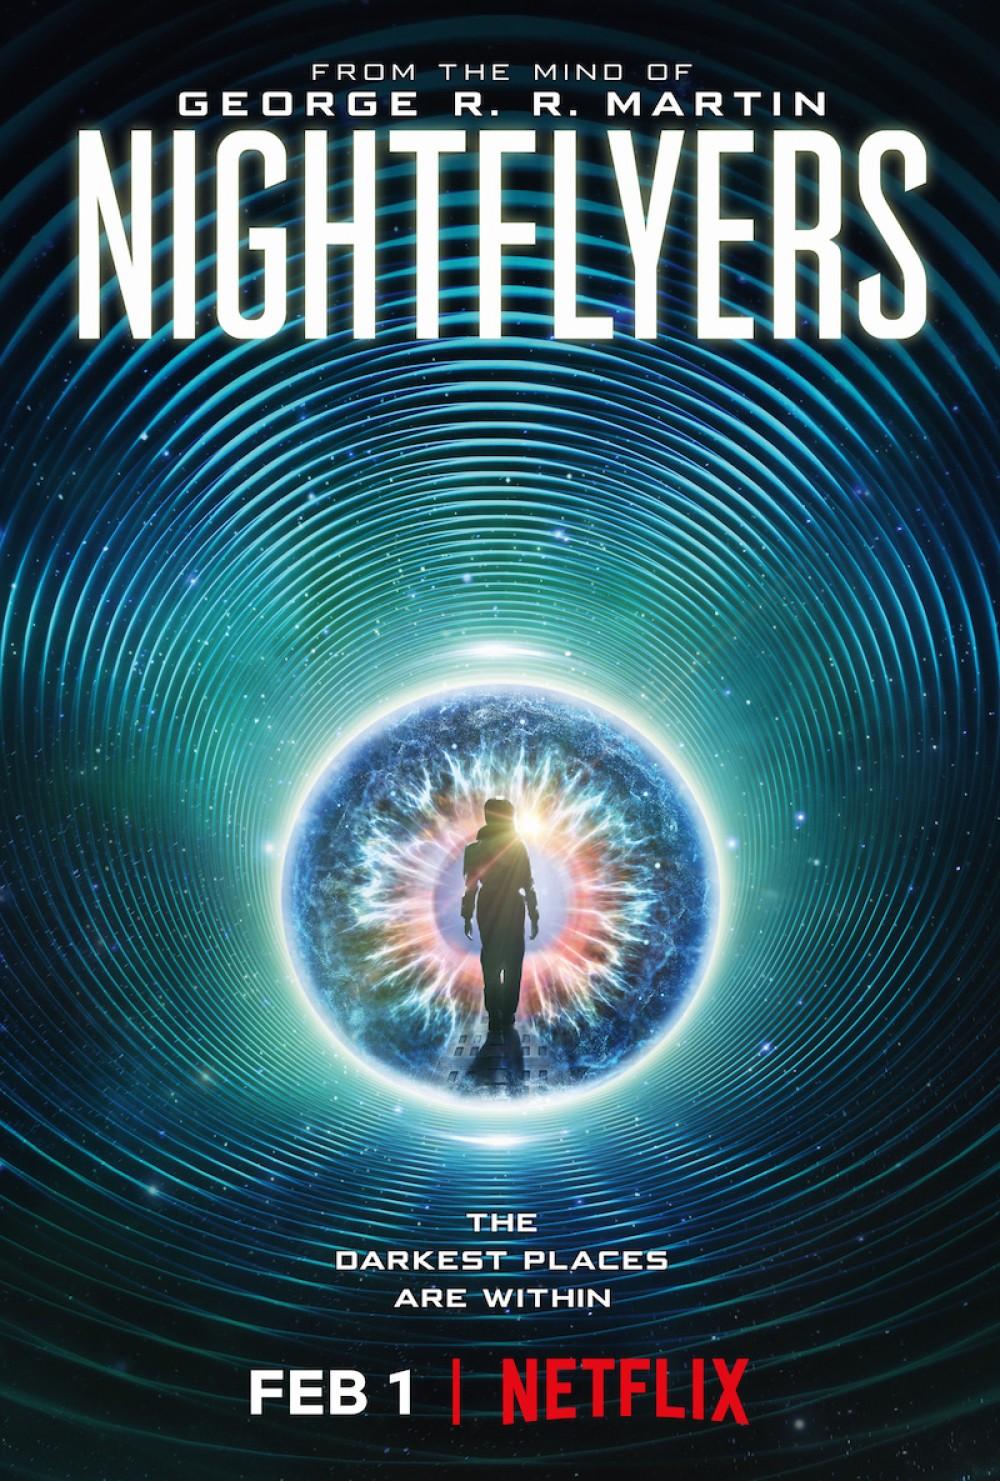 Nightflyers: Νέα σειρά με την υπογραφή του Τζορτζ P.Ρ. Μάρτιν